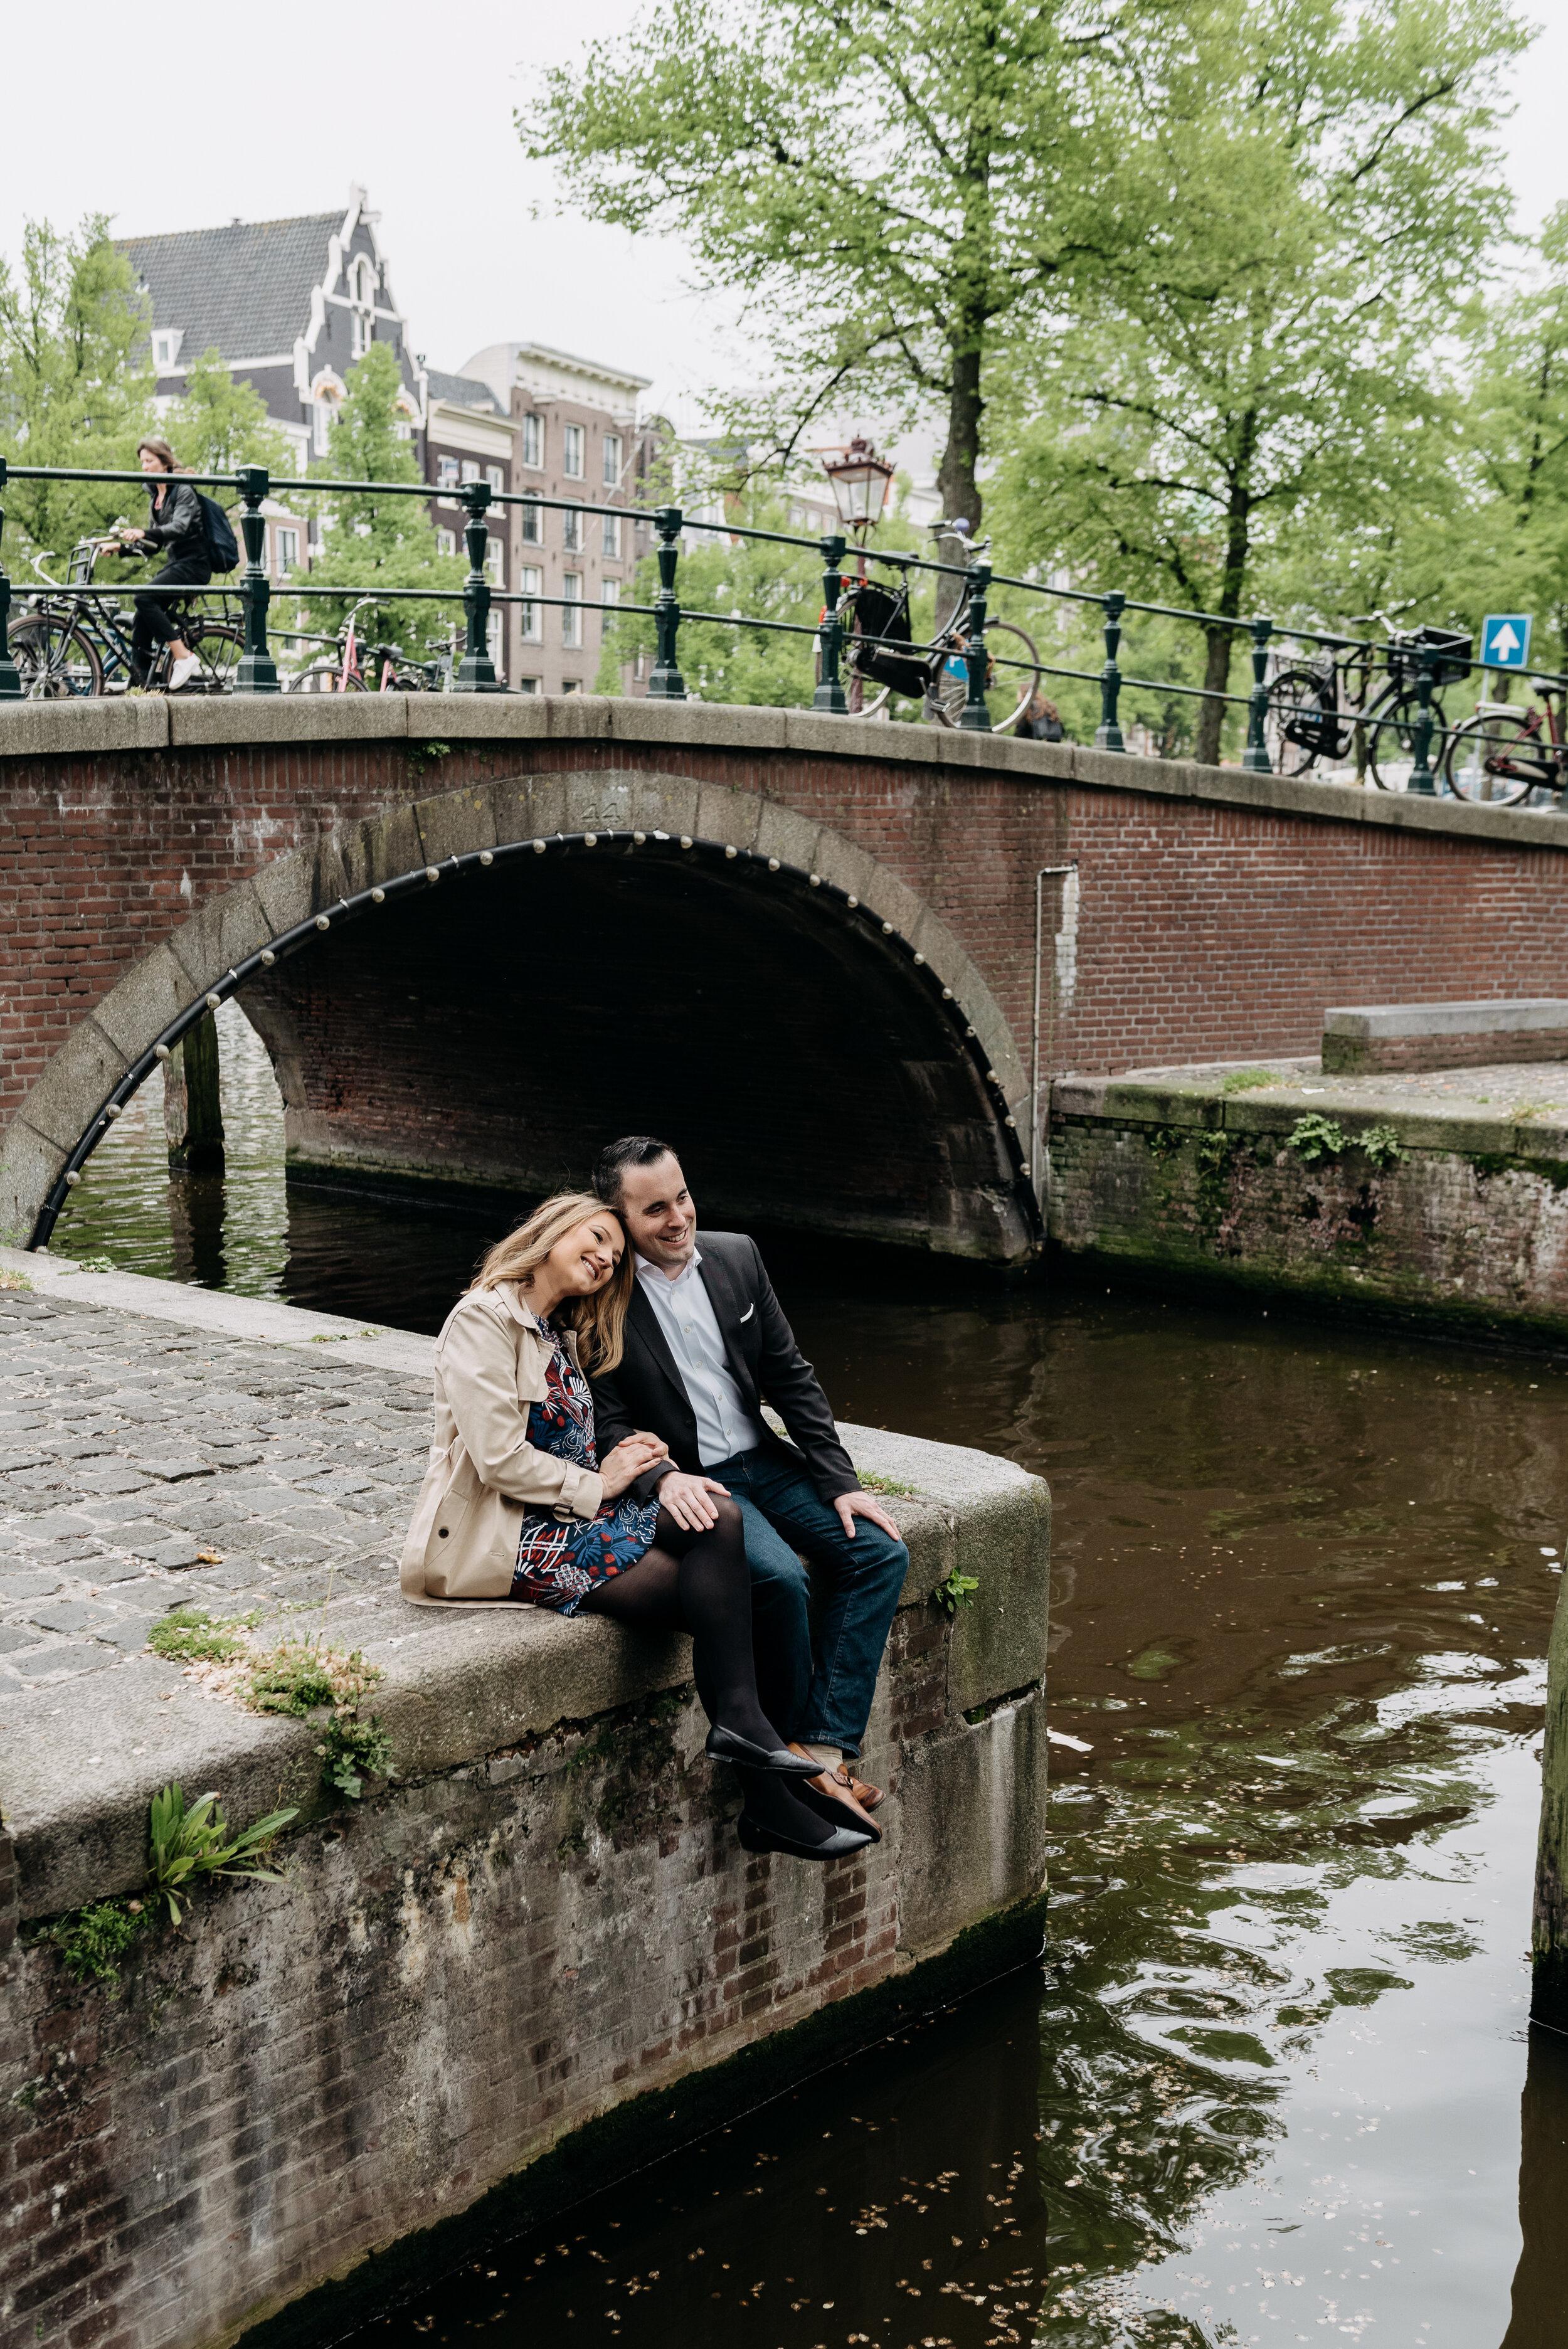 Ensaio Fotografico em Amsterda 04.jpg